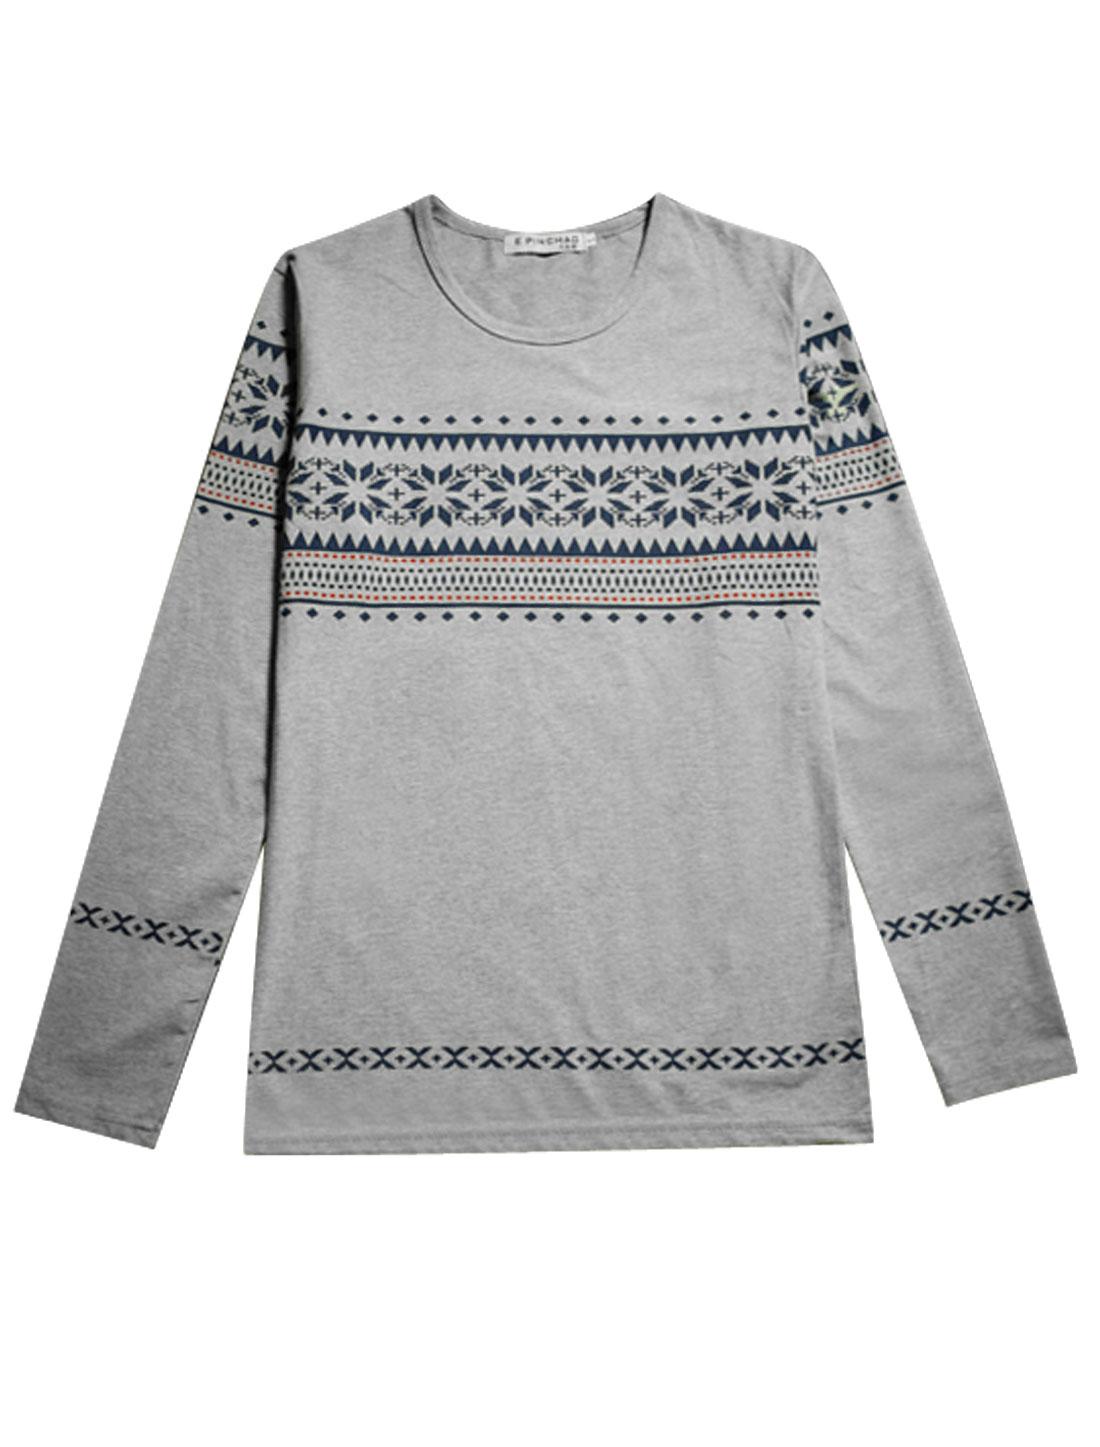 Man Long Sleeves Geometric Prints Leisure T-Shirts Gray M